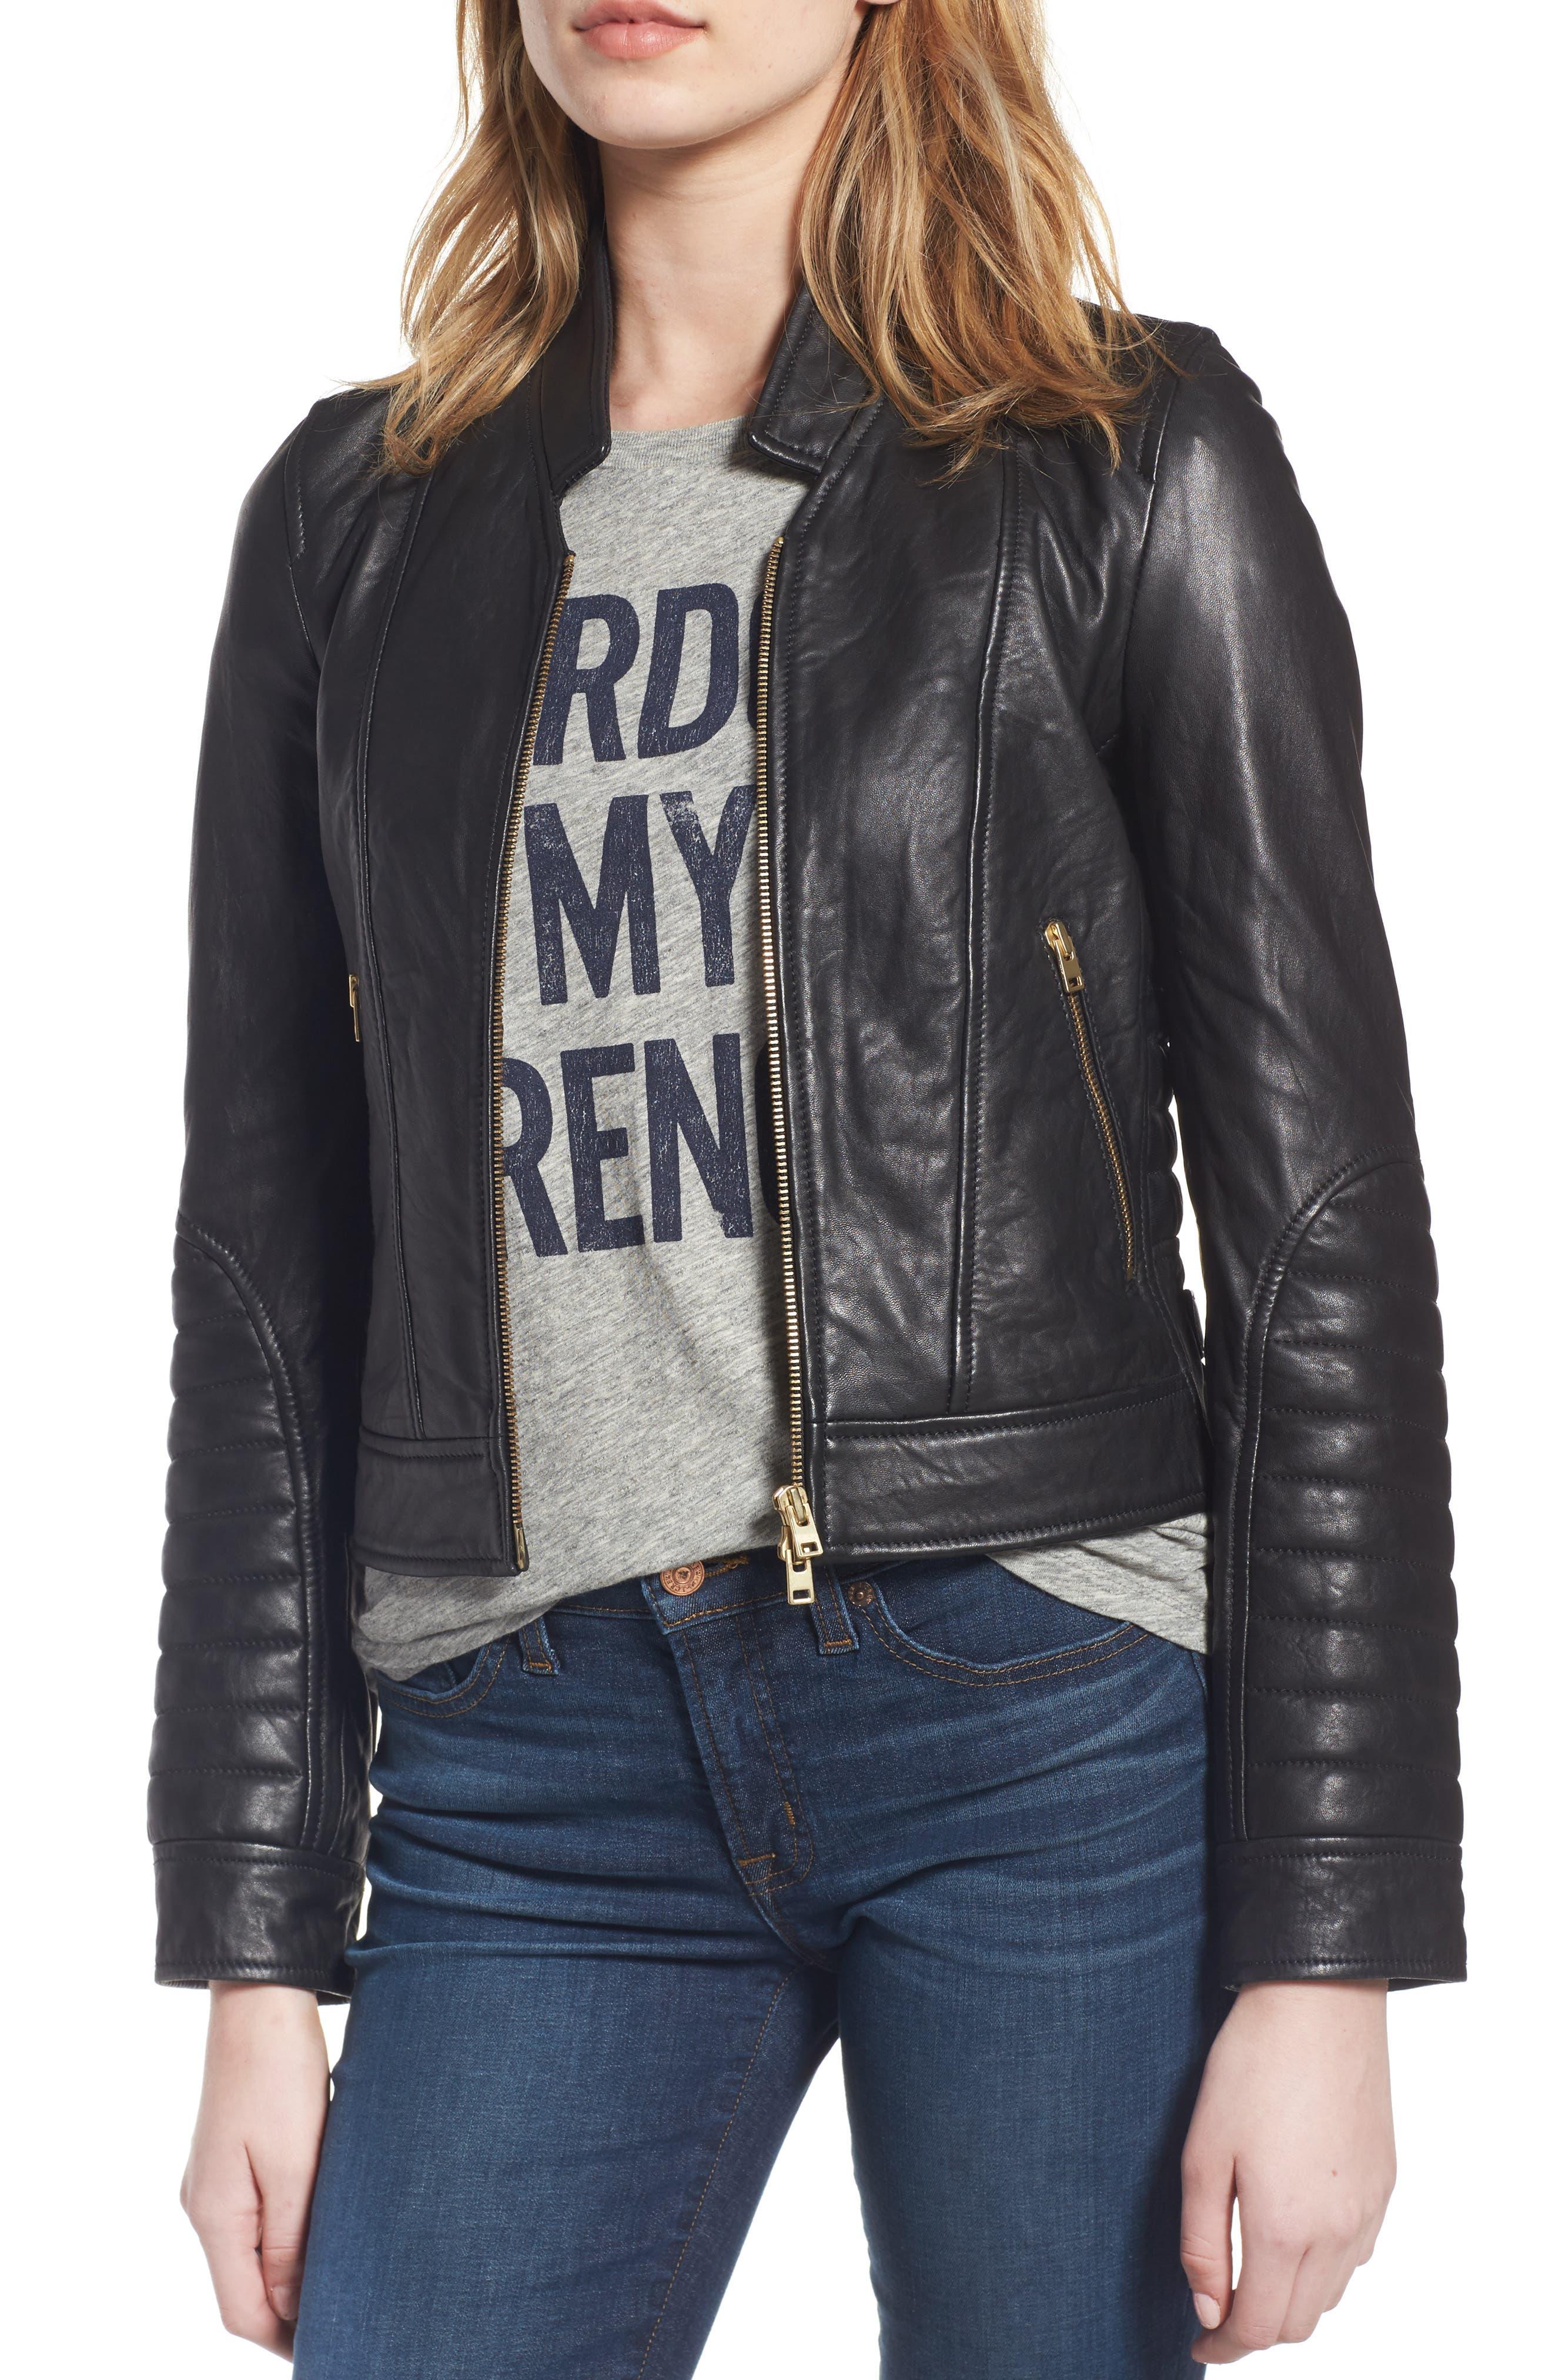 J crew leather jacket